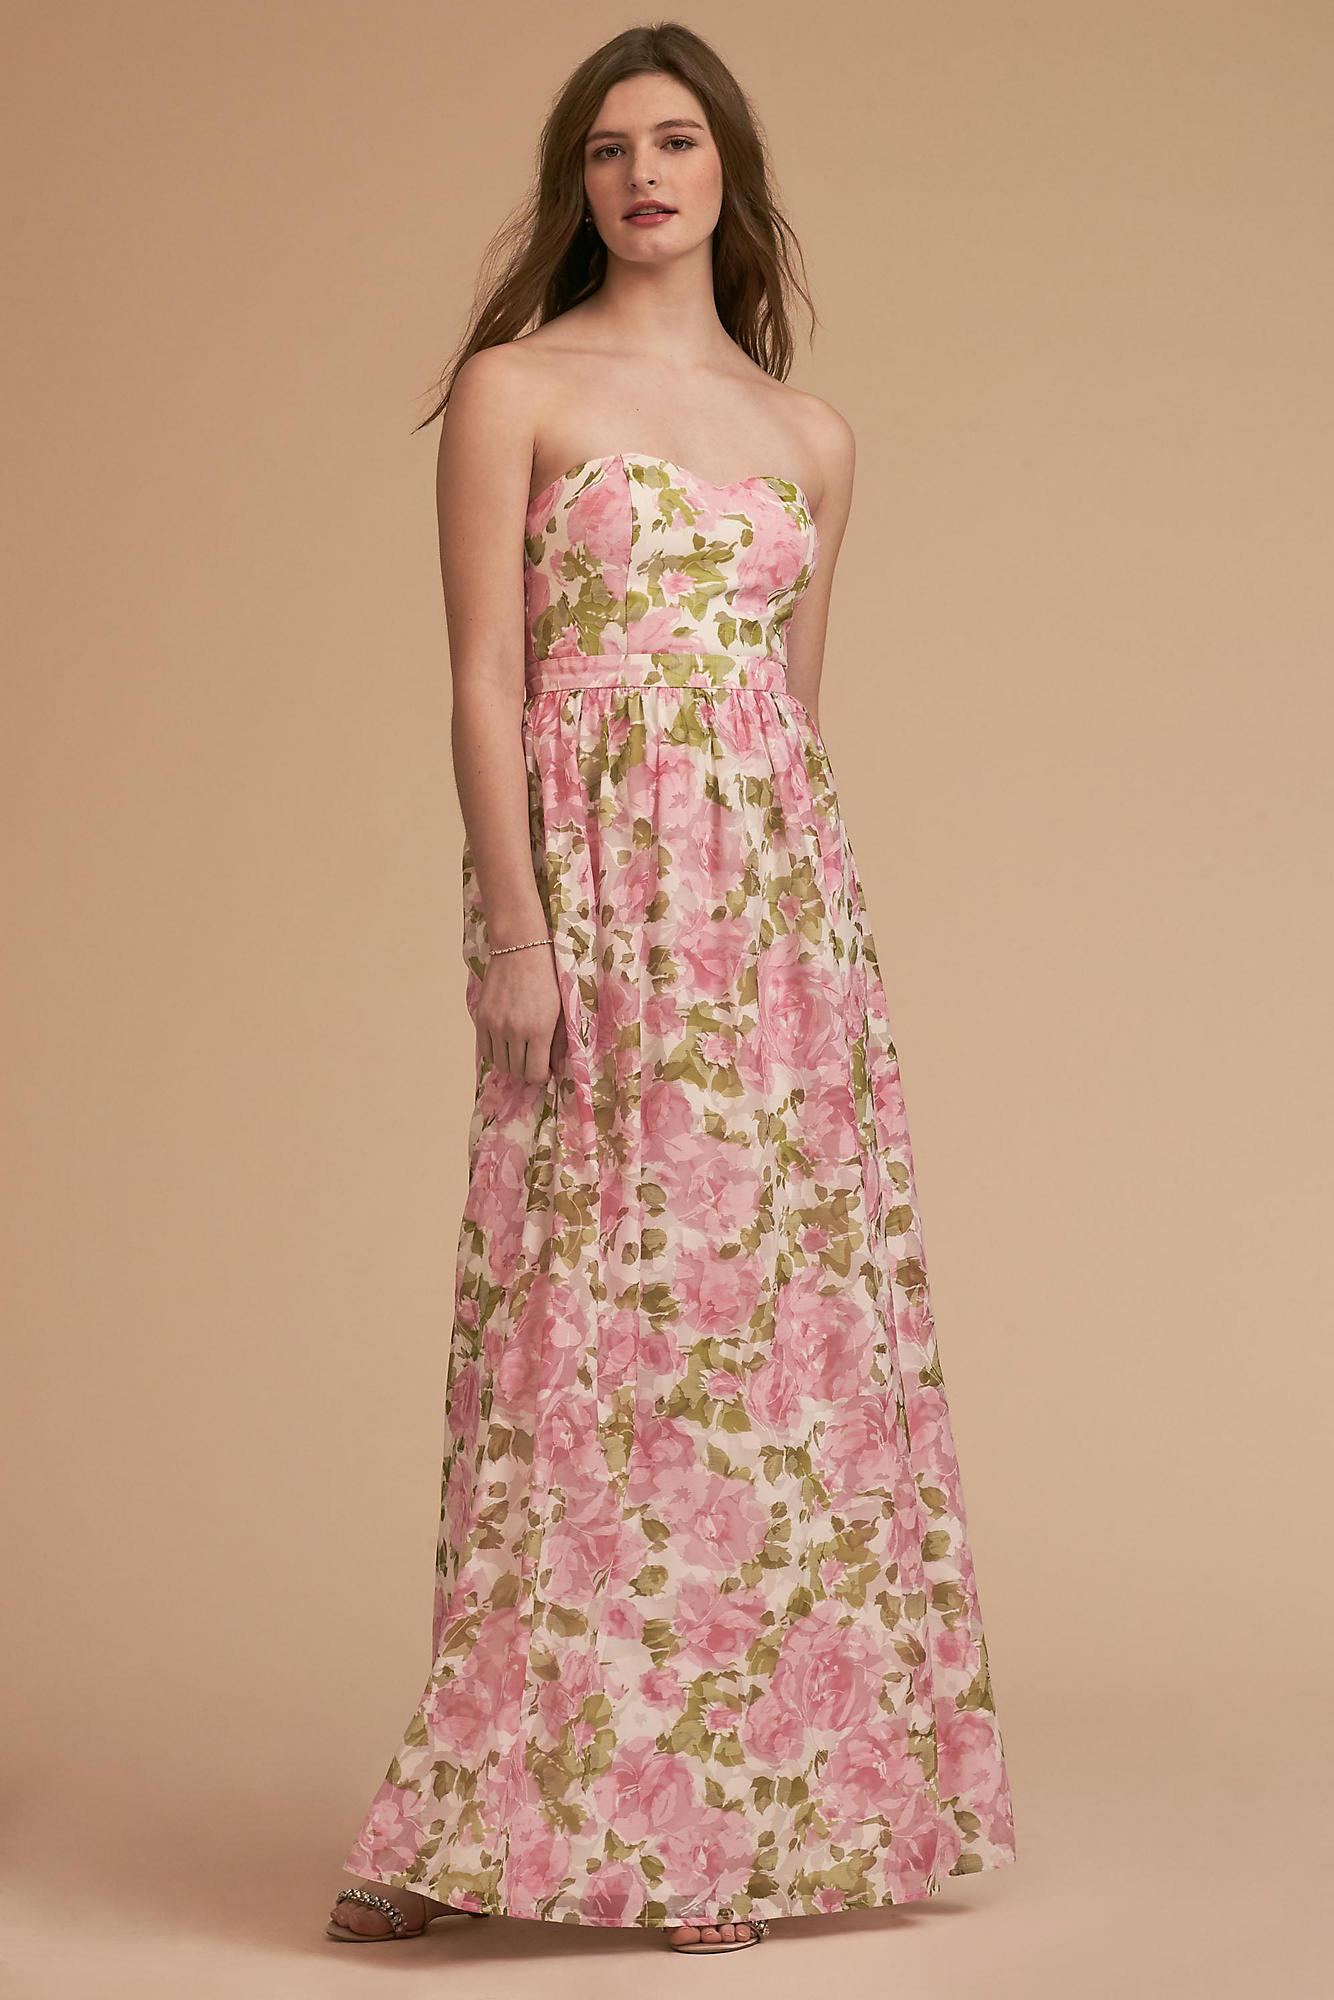 c35fa6f576d43 Lyst - Anthropologie Jessa Dress in Pink